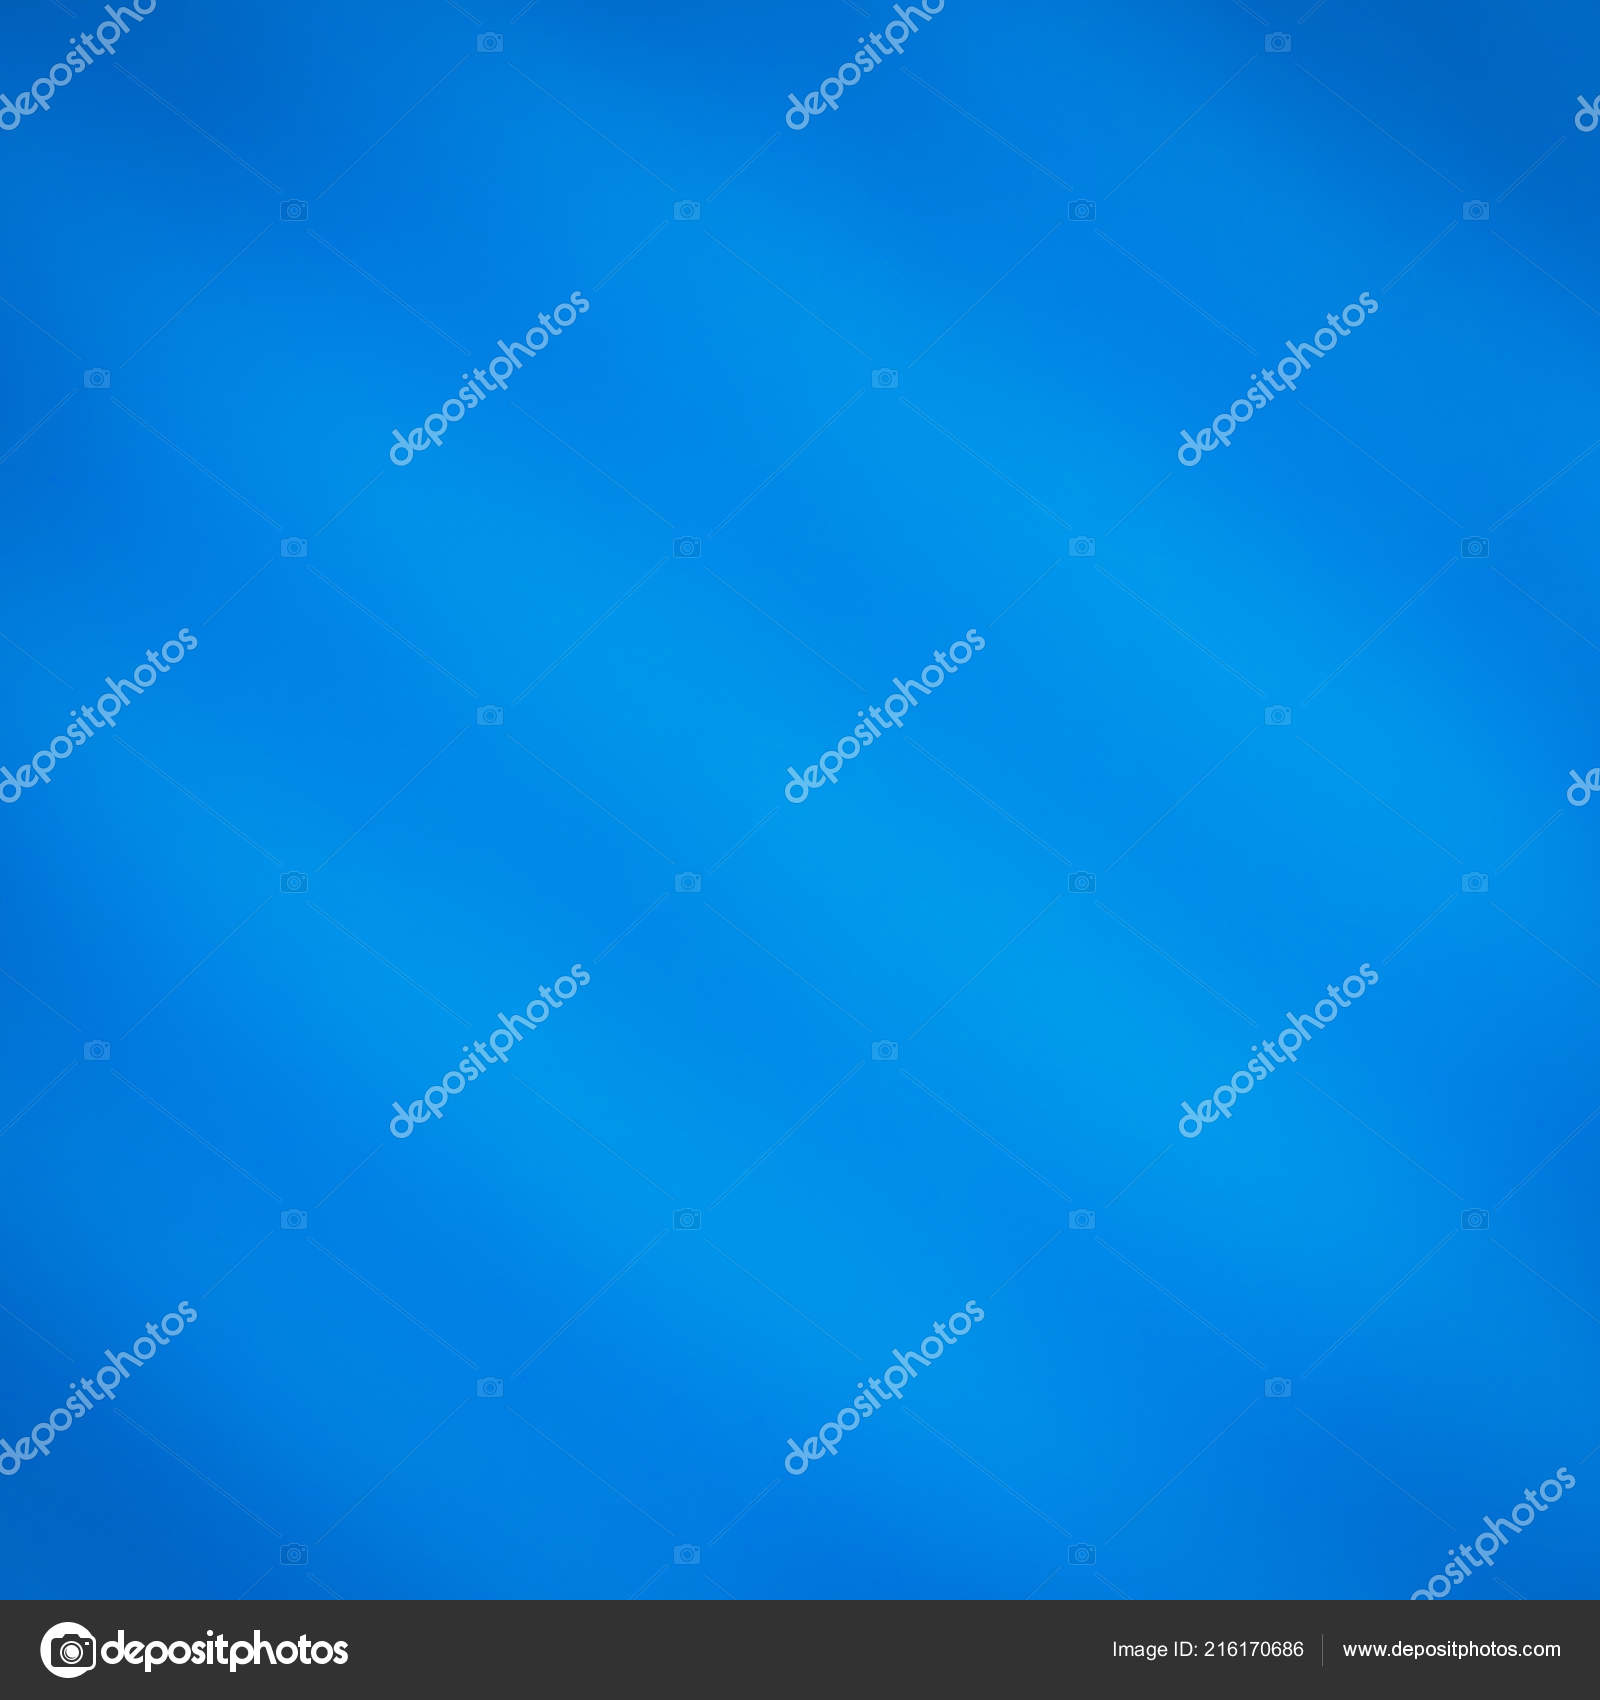 Blue Background Abstract Blur Gradient Bright Clean Navy White